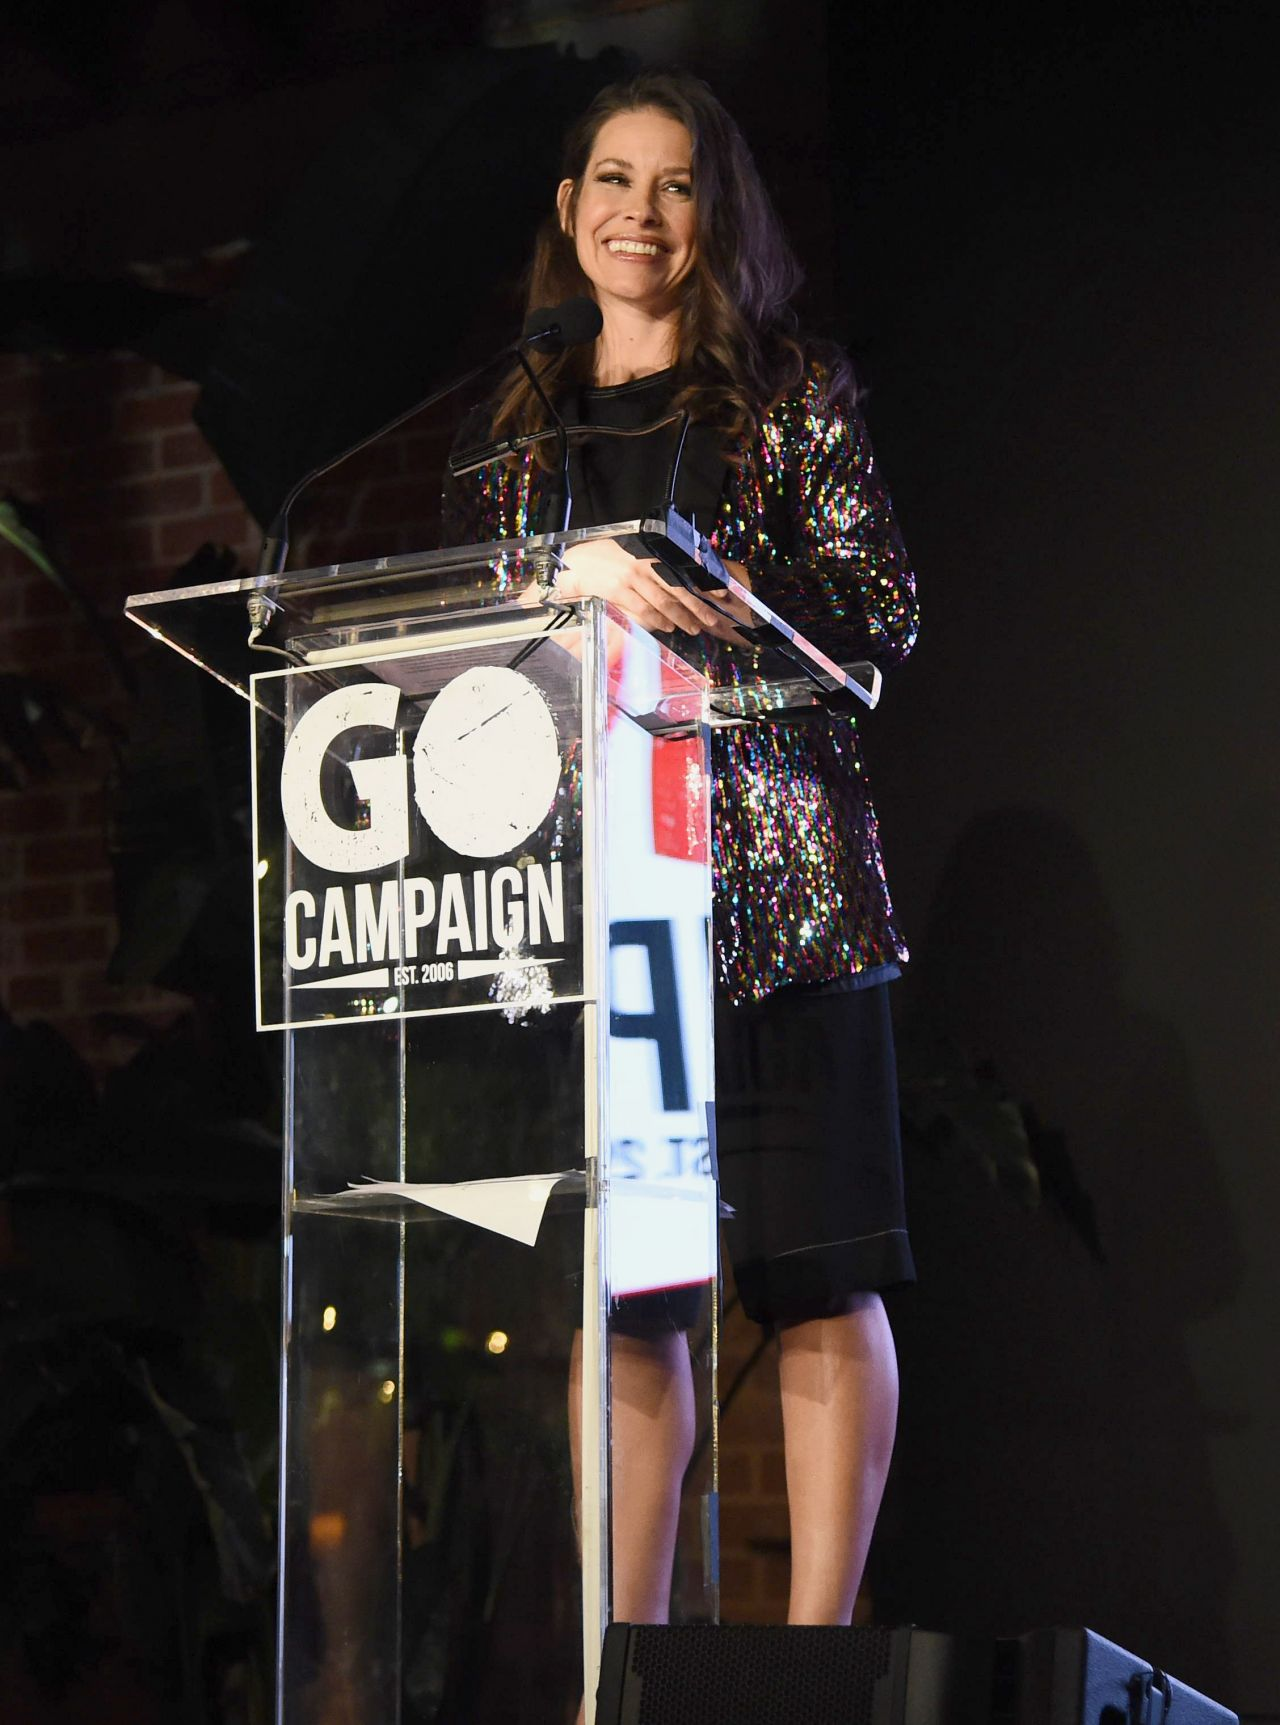 https://celebmafia.com/wp-content/uploads/2018/10/evangeline-lily-go-campaign-gala-in-los-angeles-10-20-2018-3.jpg